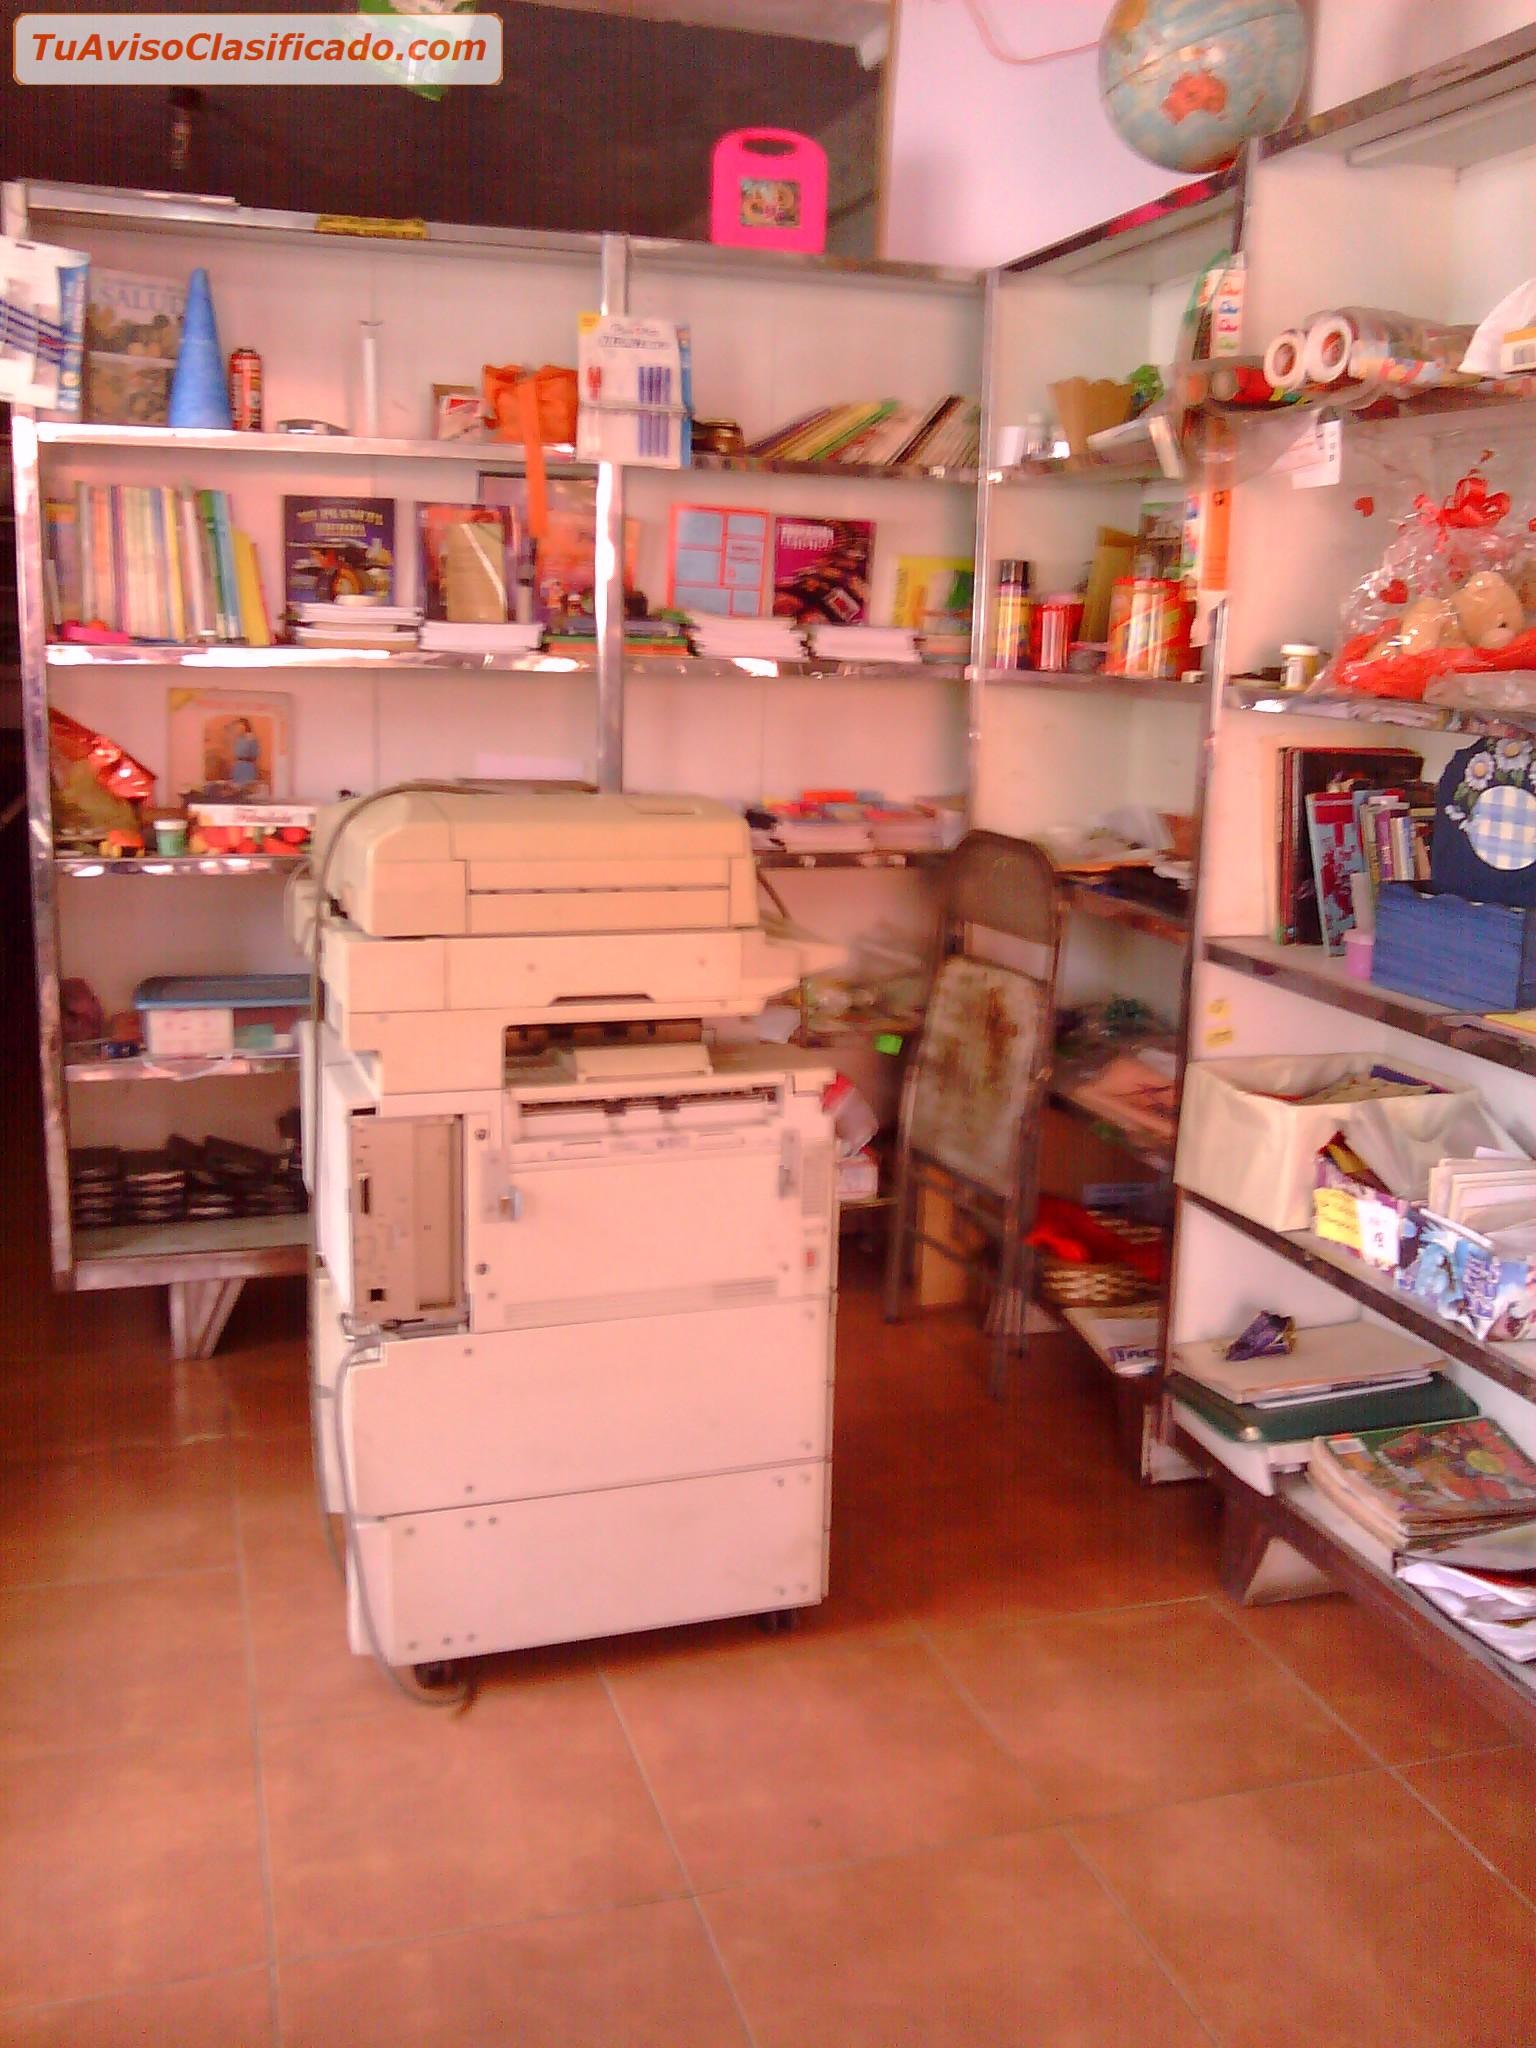 Librer a papeler a art culos de oficina y mobiliario - Mobiliario para libreria ...